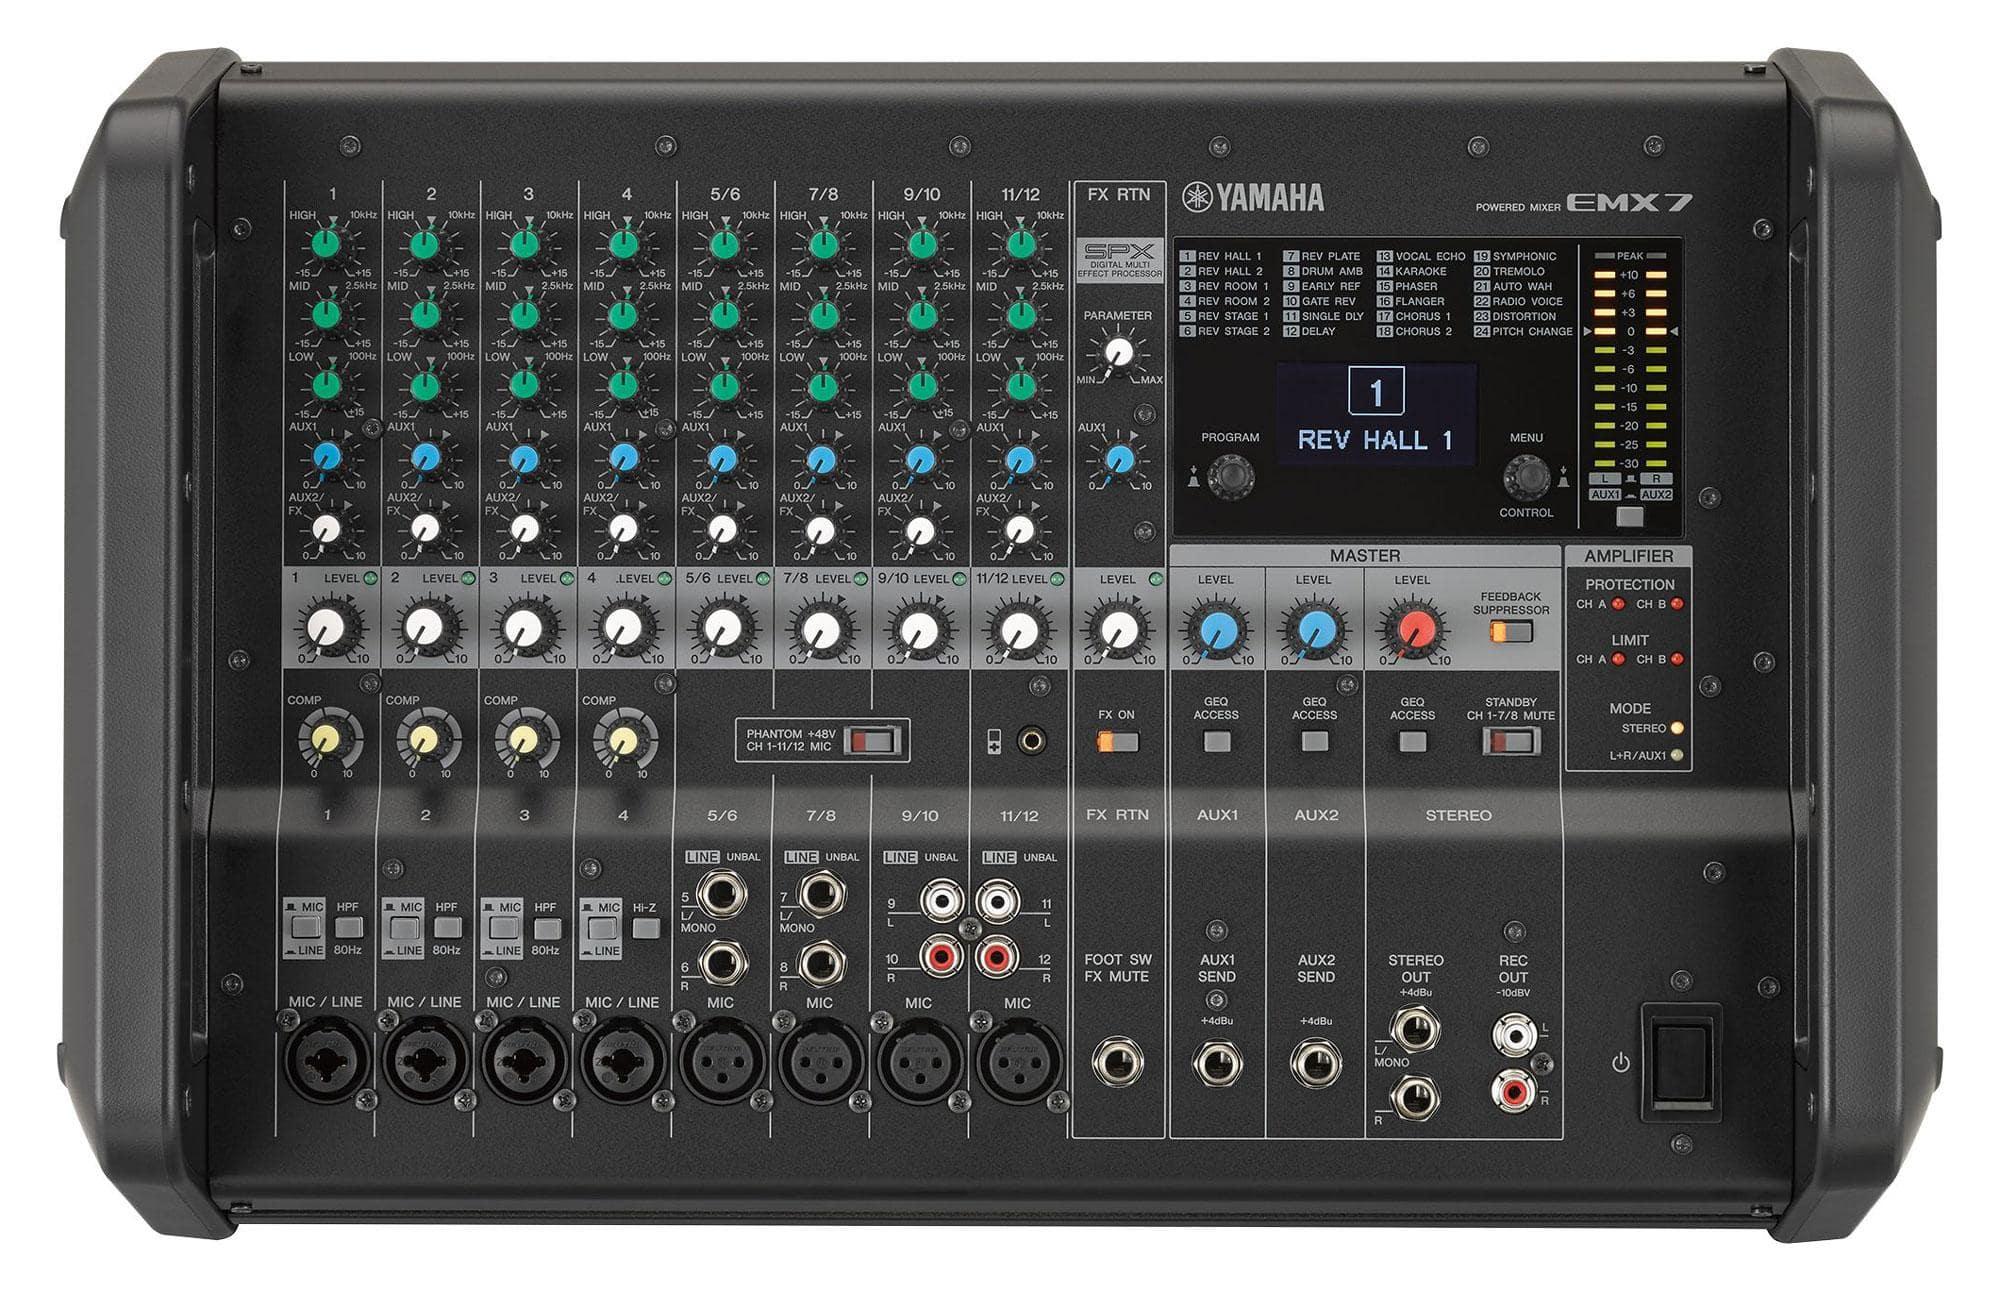 Mikrofone - Yamaha EMX 7 Powermixer Retoure (Zustand sehr gut) - Onlineshop Musikhaus Kirstein